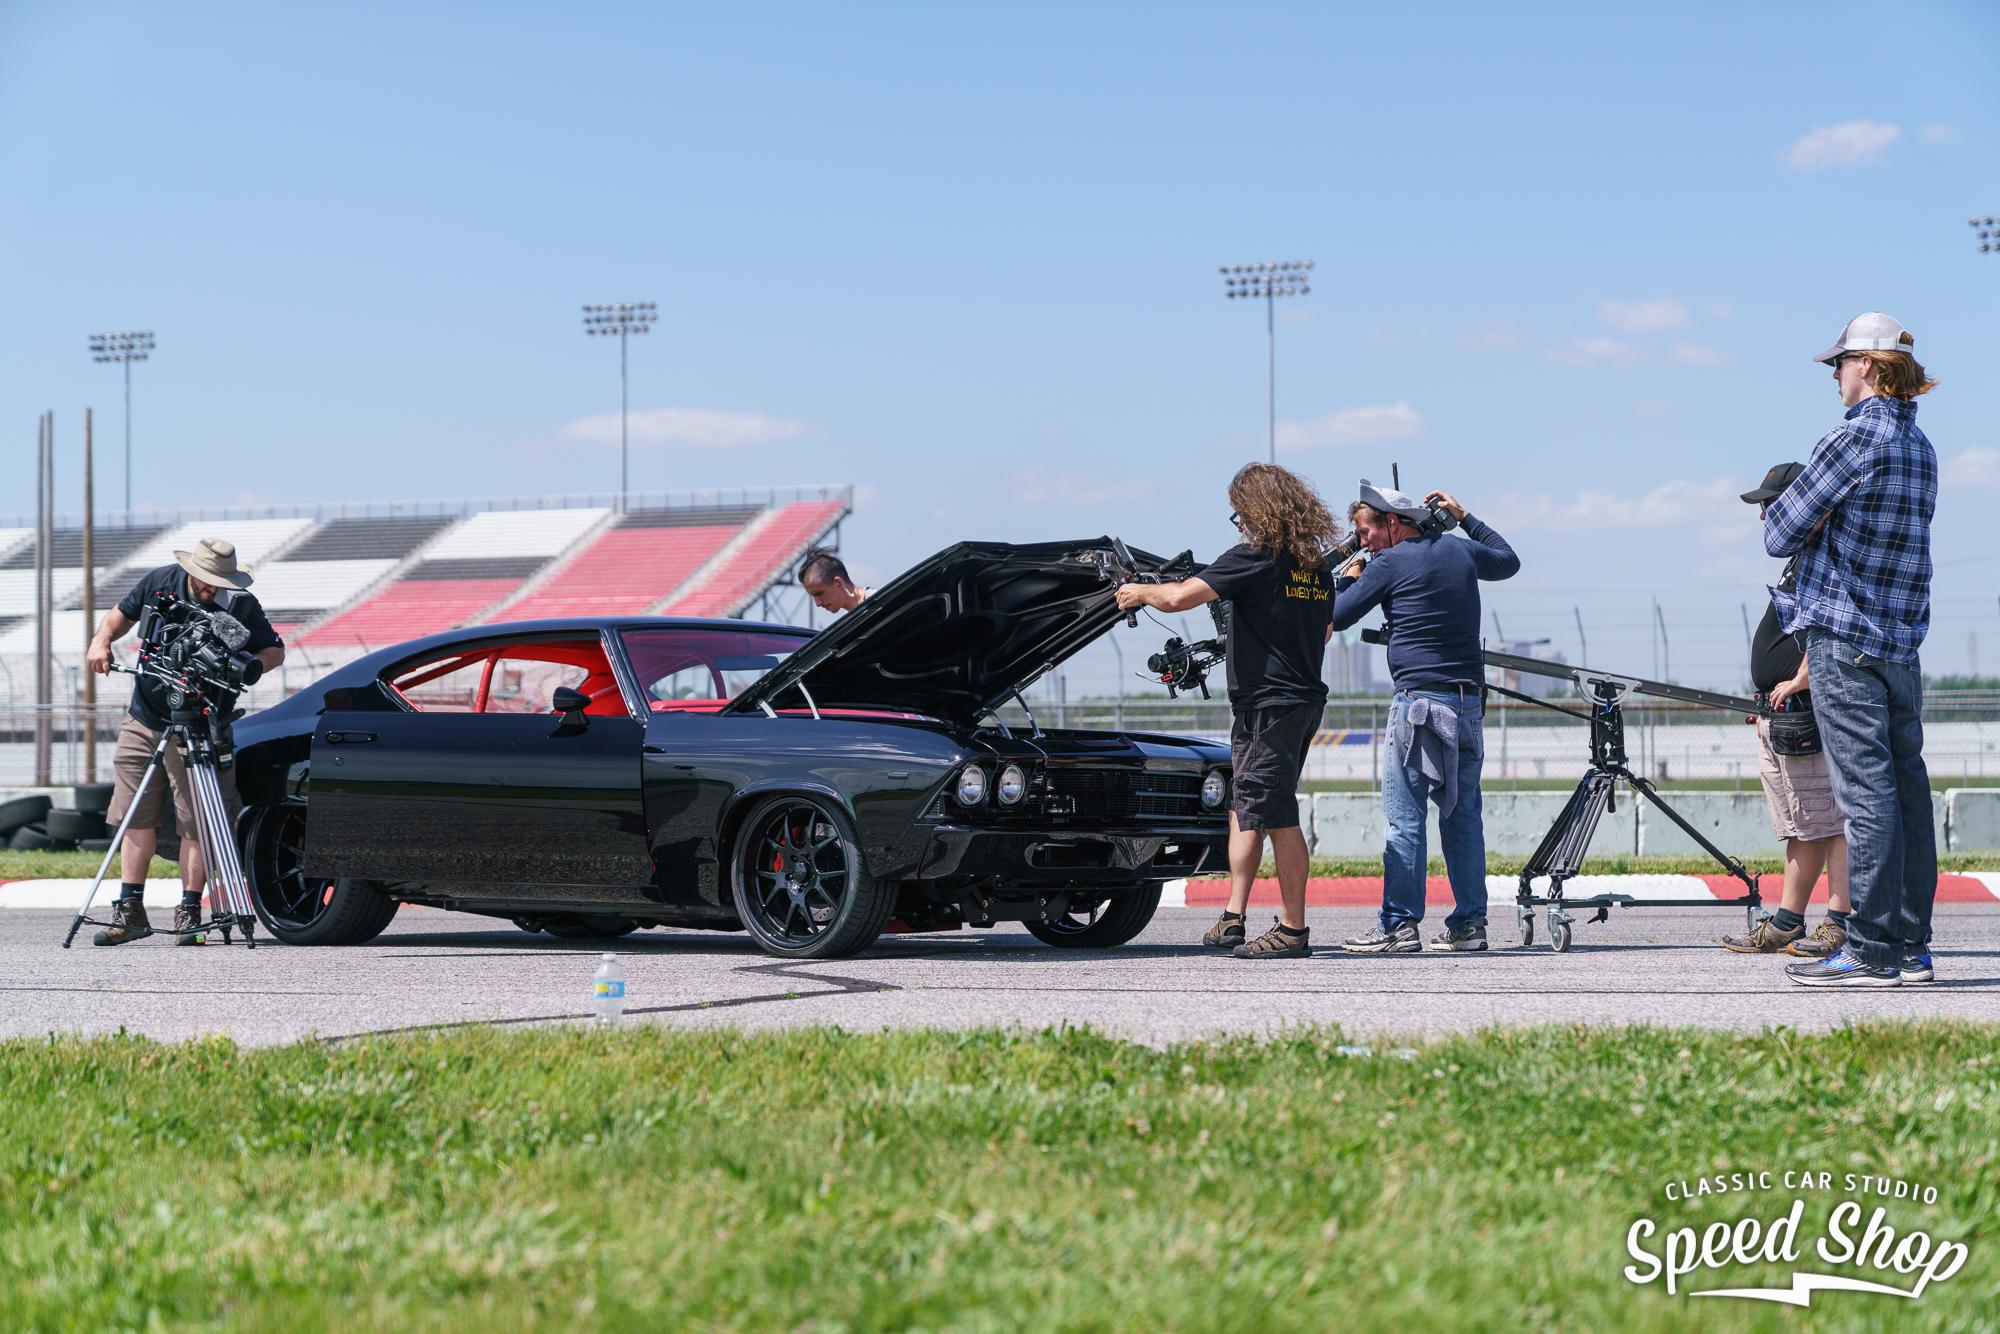 behind the scenes Classic Car Studio Speed Shop